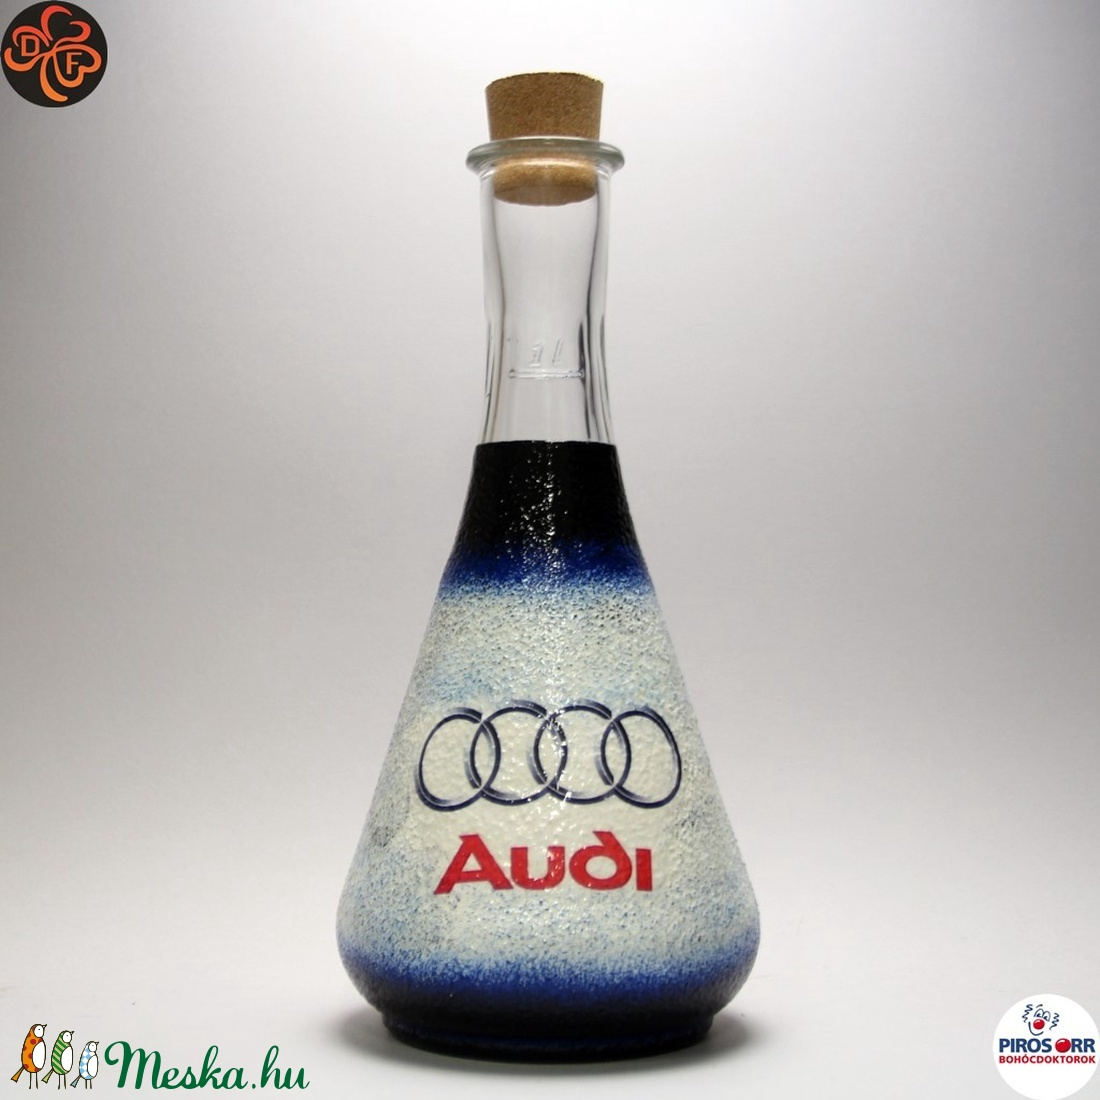 Audi bor kiöntő ; Audi rajongóknak (decorfantasy) - Meska.hu